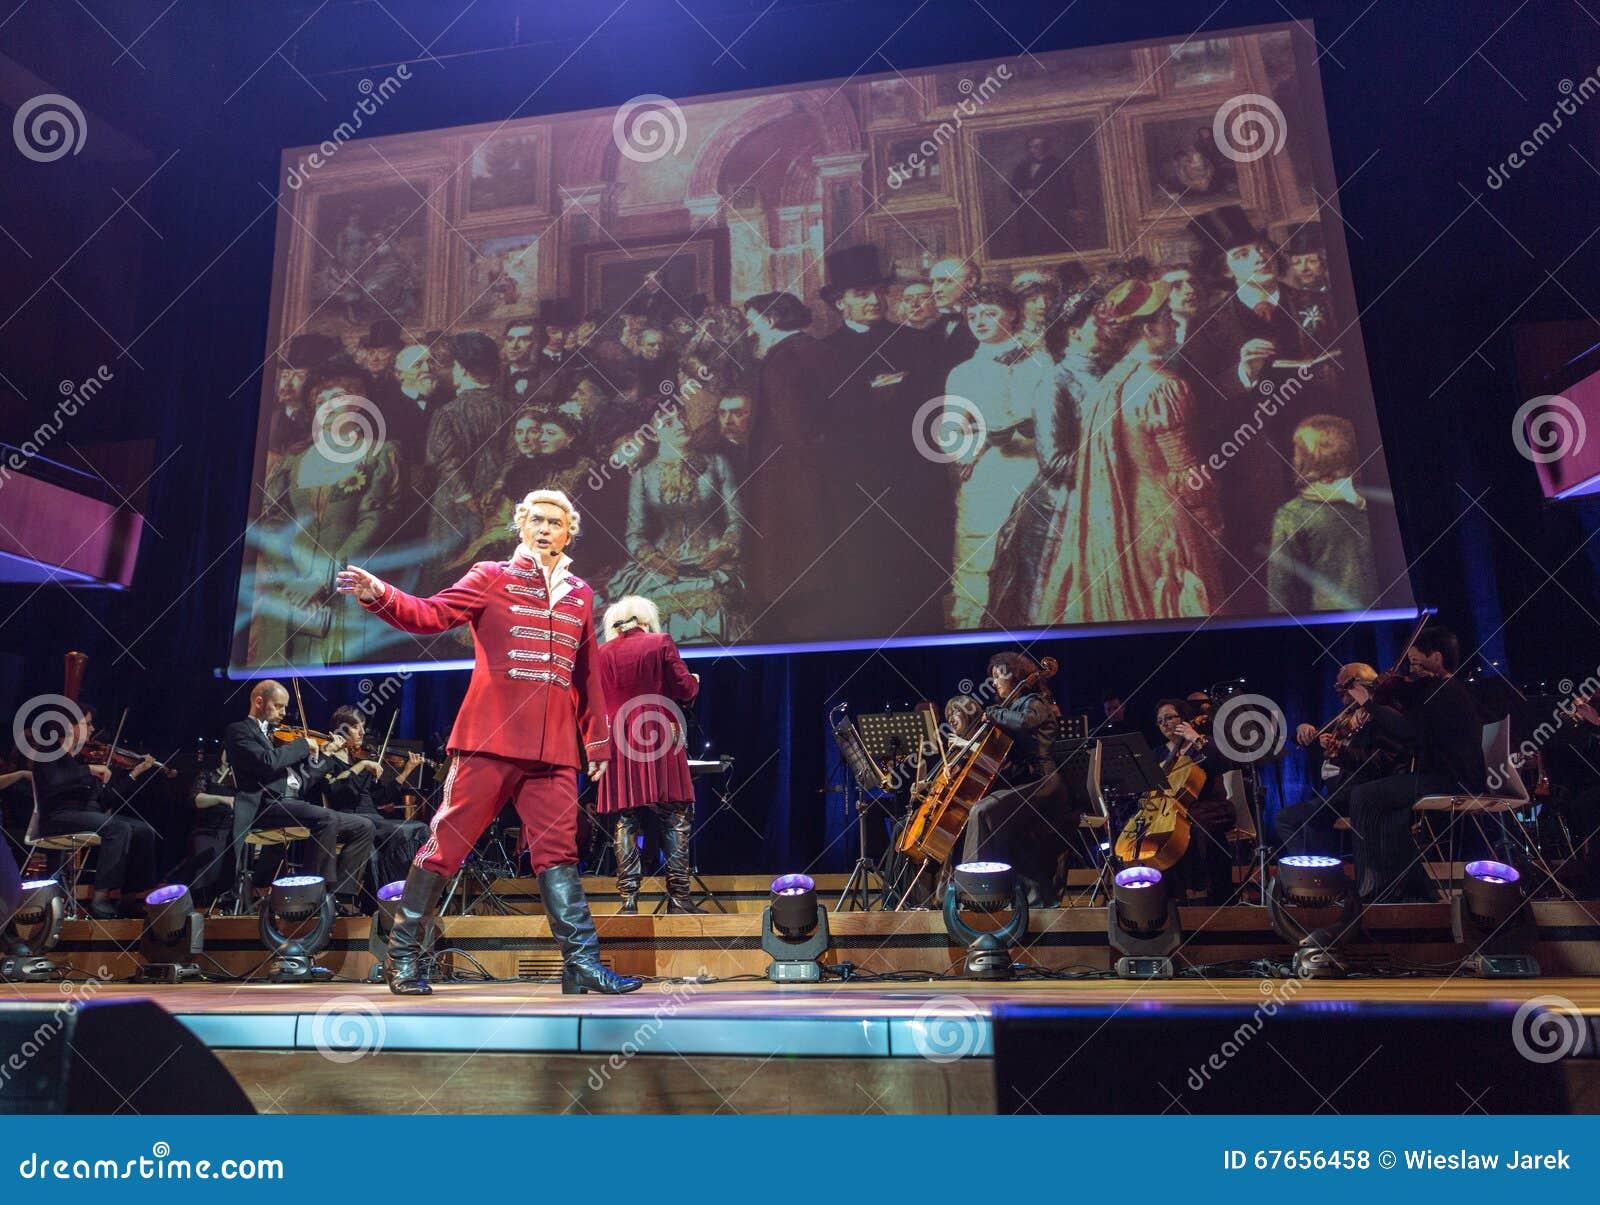 Schouwspel die Filharmonia Futura en M kenmerken Walewska - de Opera is het Leven